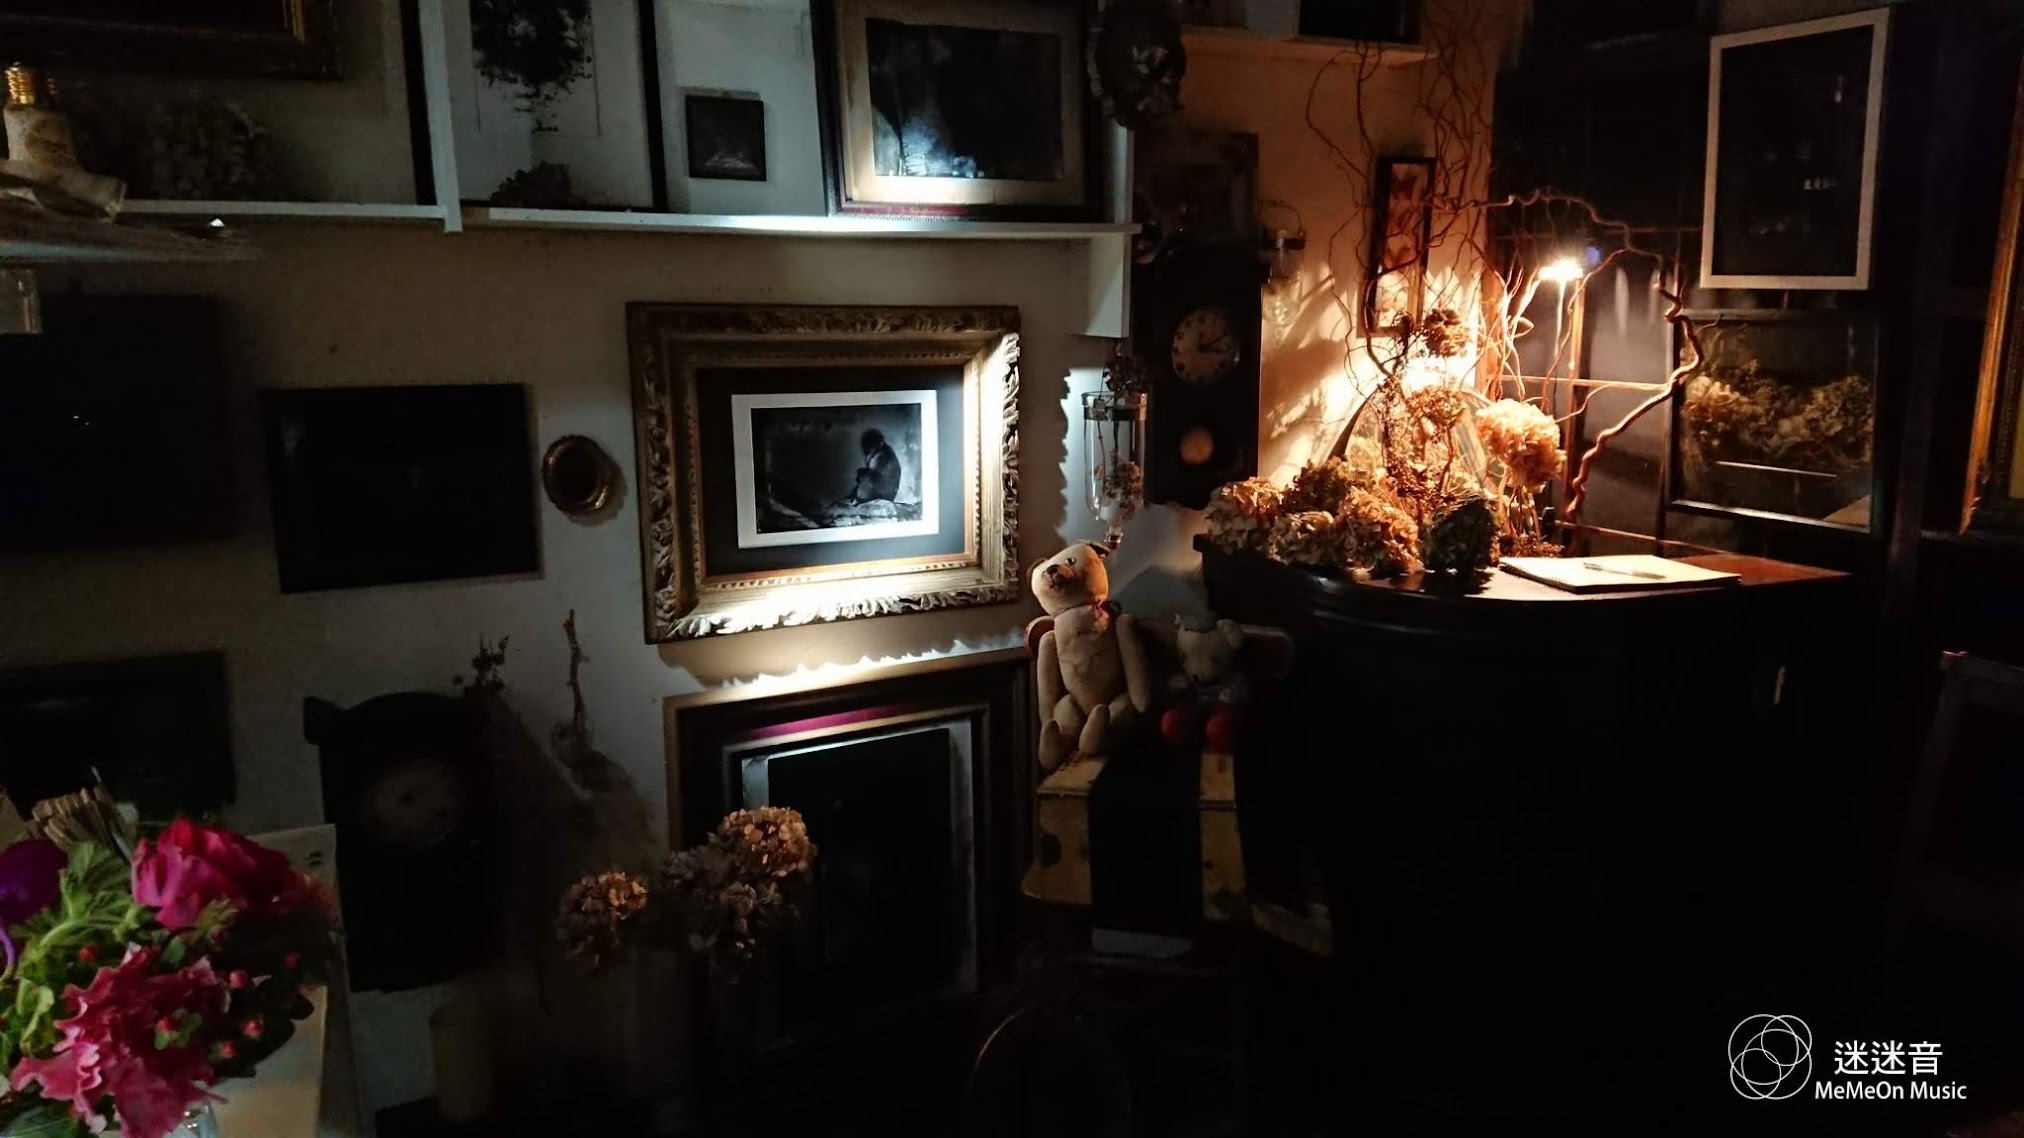 【迷迷現場】 寫真館Gelatin (寫眞館ゼラチン)東京個展「ROOM_#5」 季節限定的光影之美